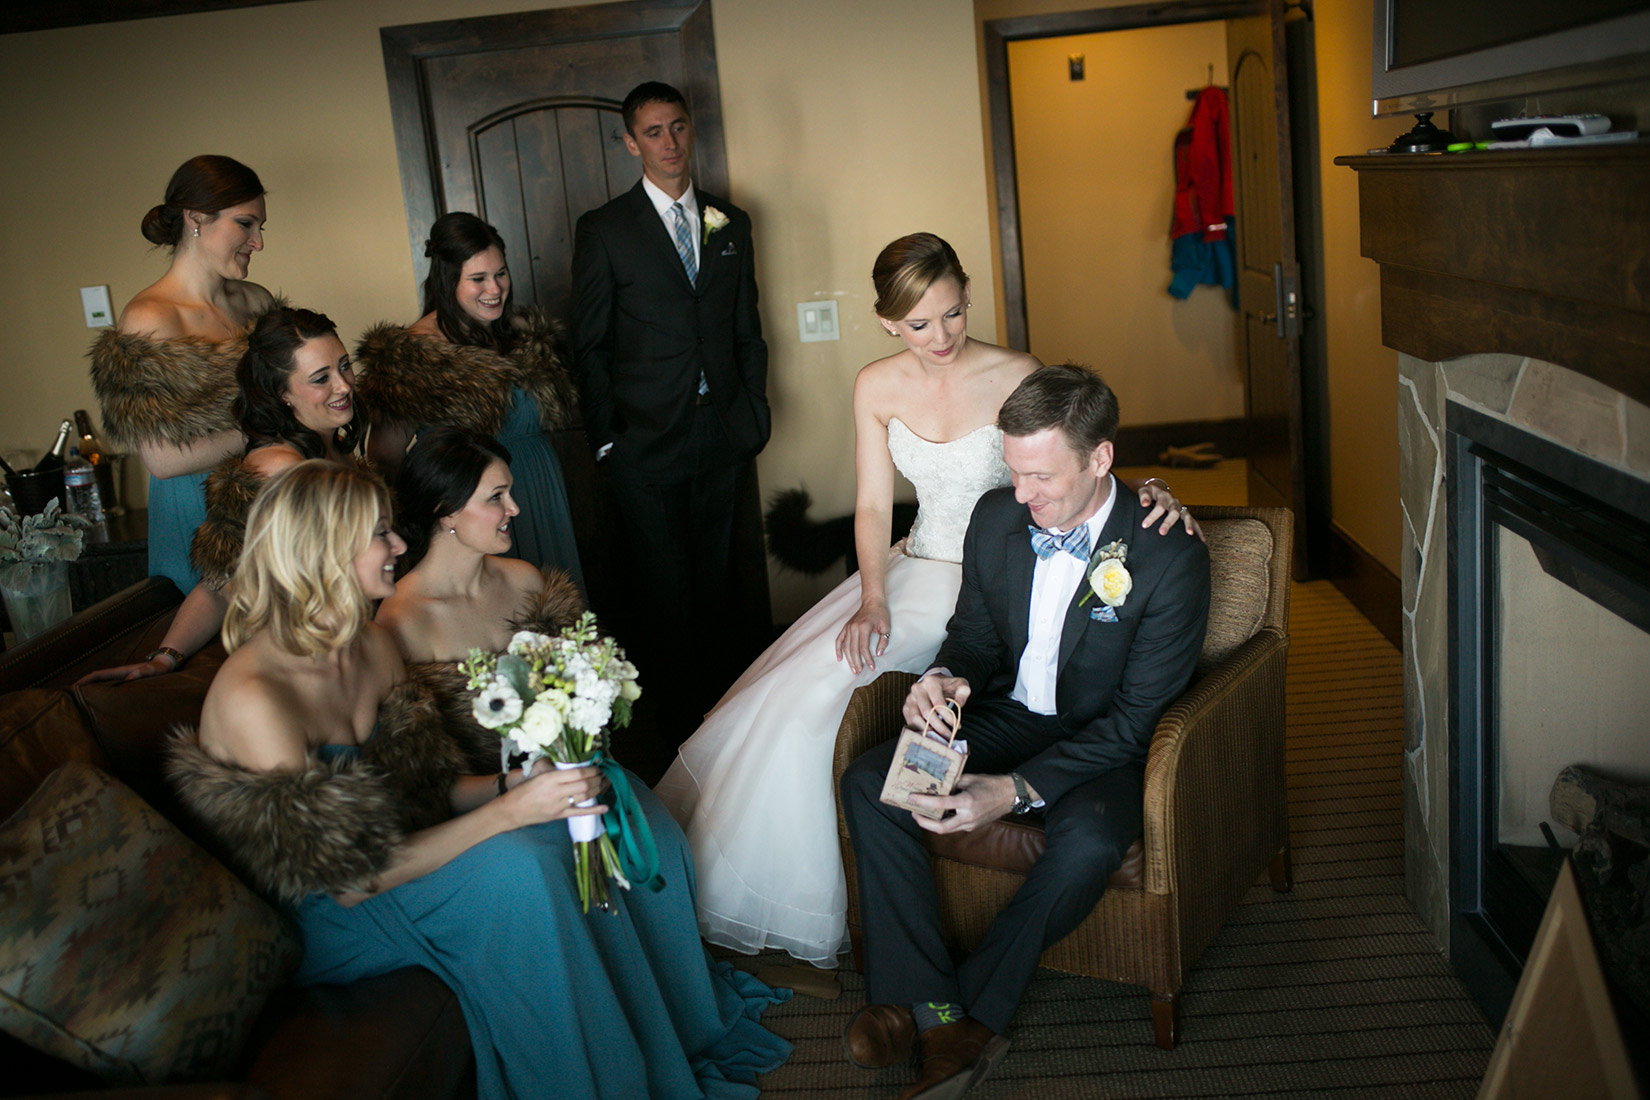 West-Shore-Cafe-wedding-Tahoe-11